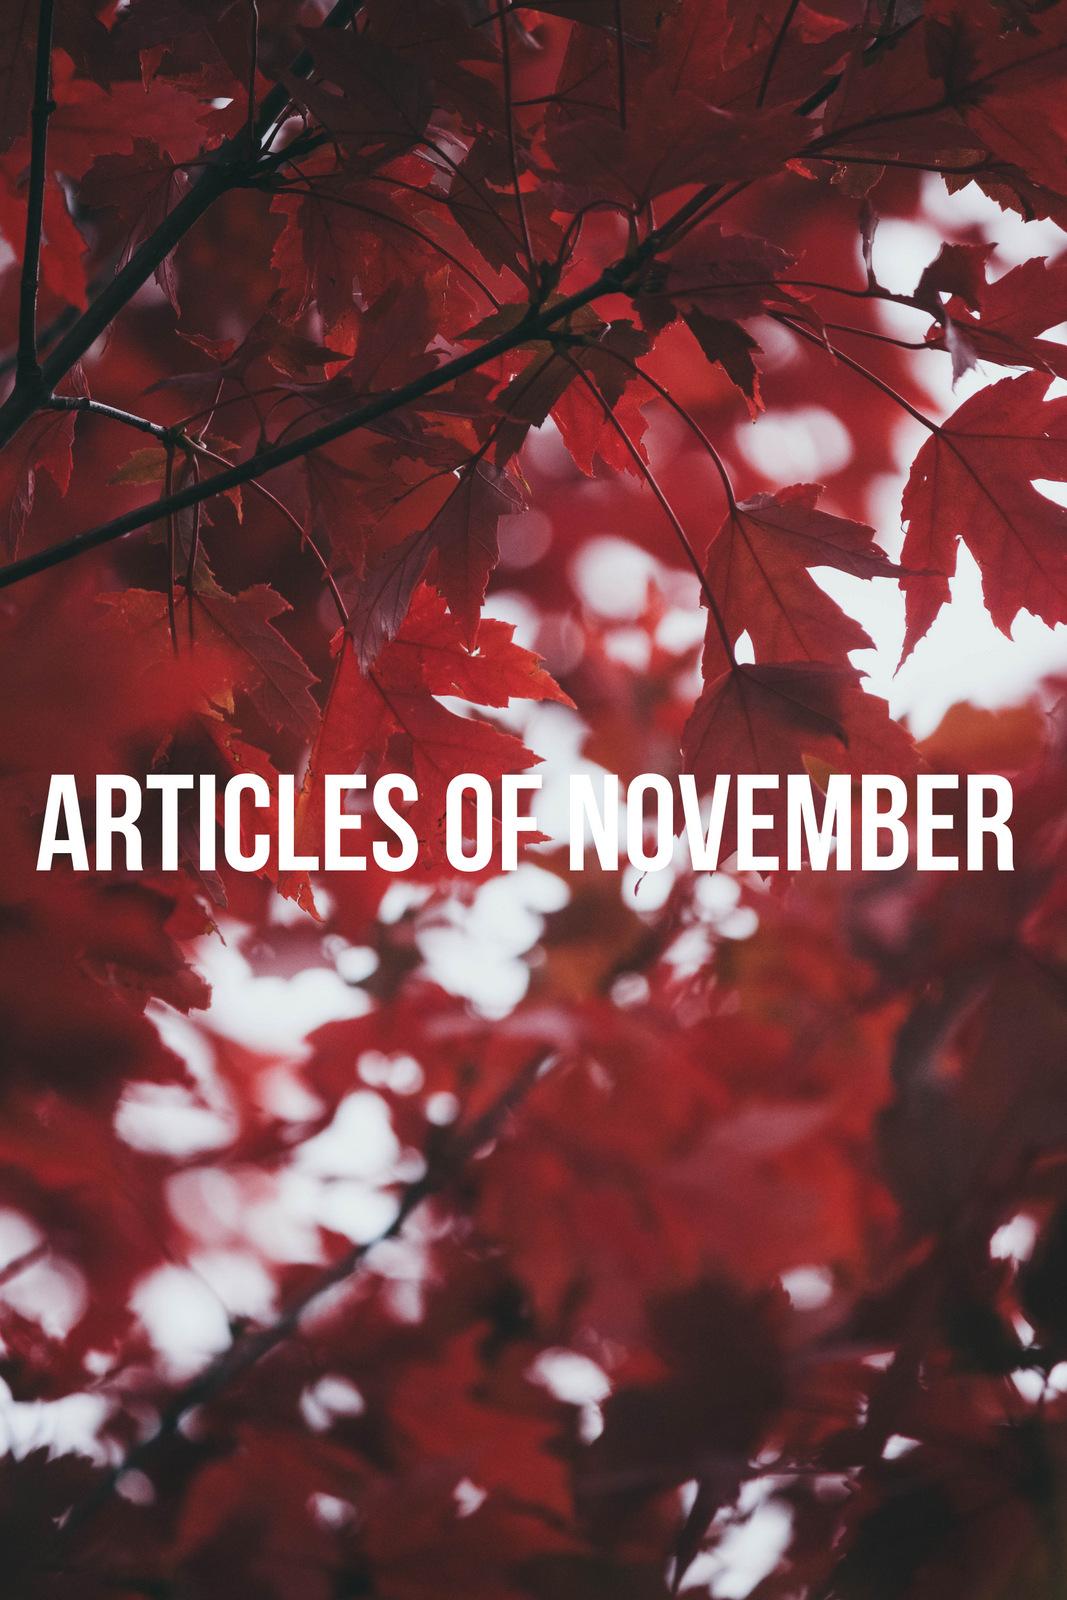 Articles of November 2018